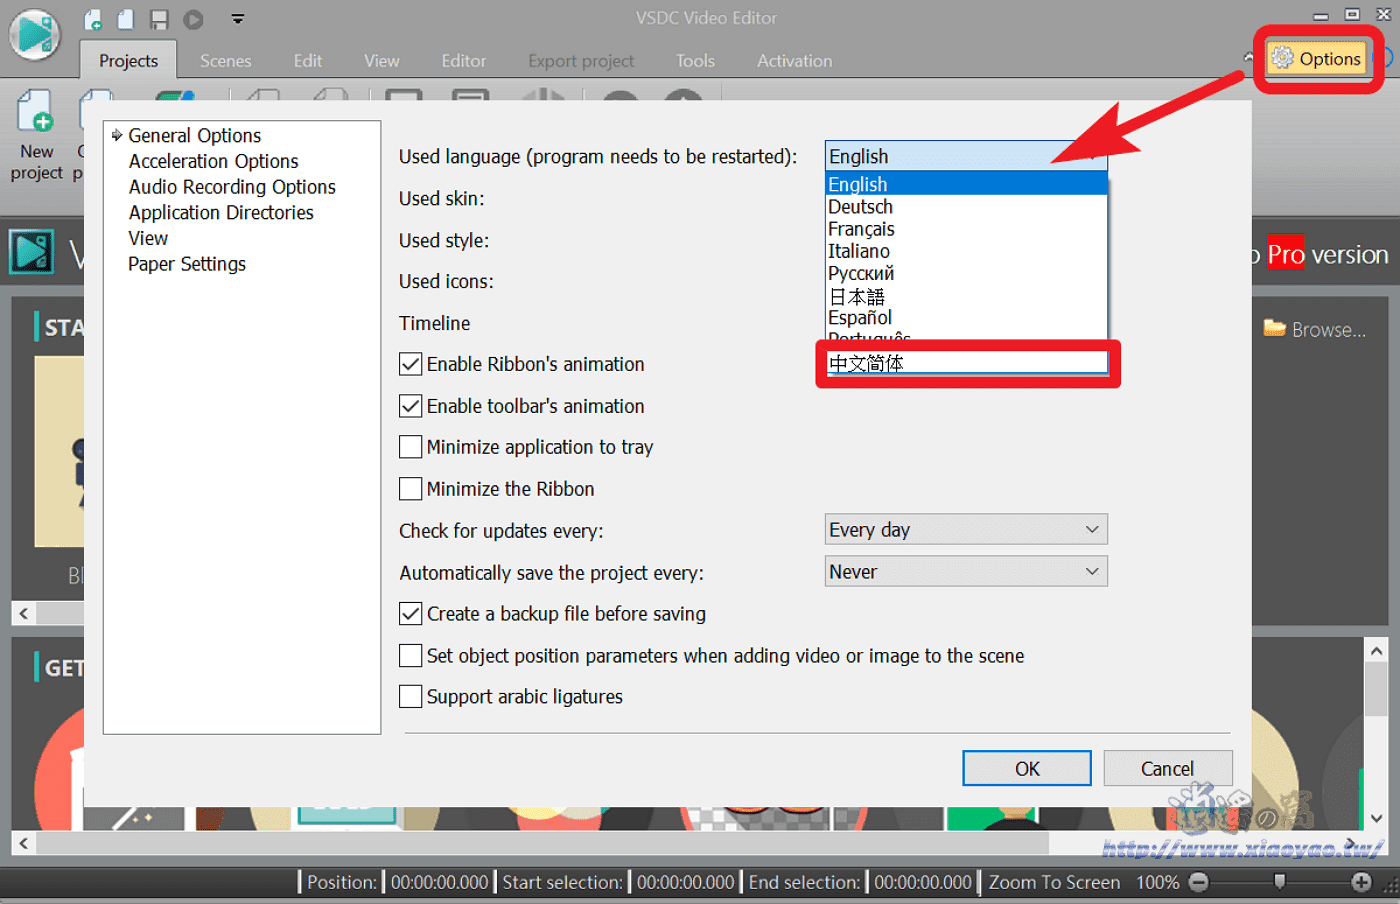 VSDC Free Video Editor 免費影片剪輯軟體